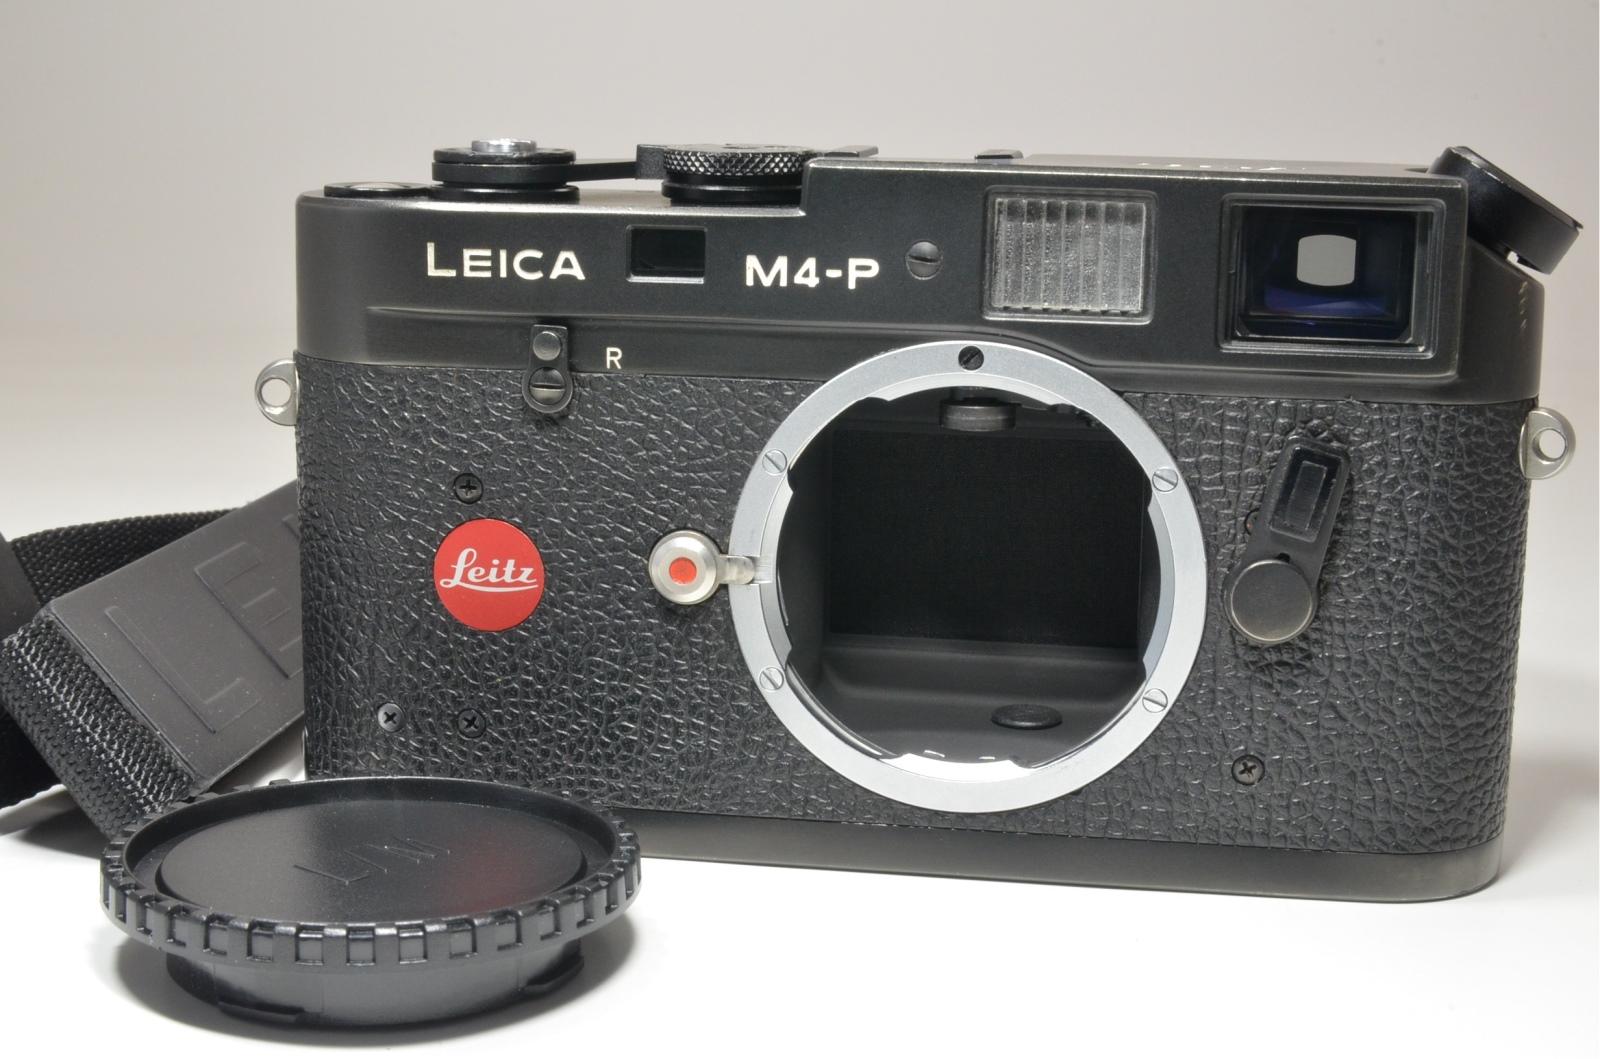 leica m4-p black 35mm rangefinder film camera s/n *1552782 with strap